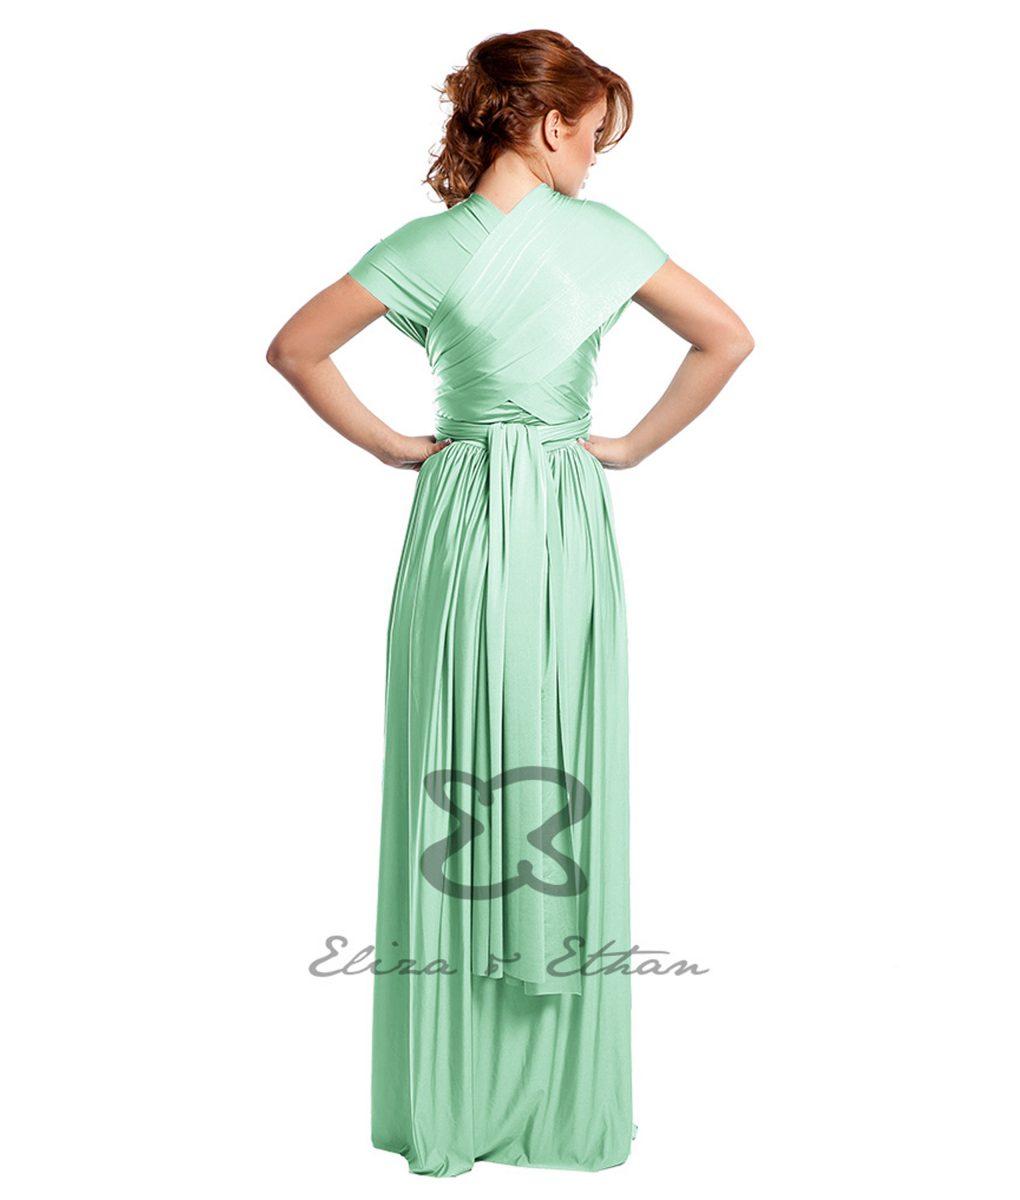 Eliza & Ethan Mint Multiway Dress Alila